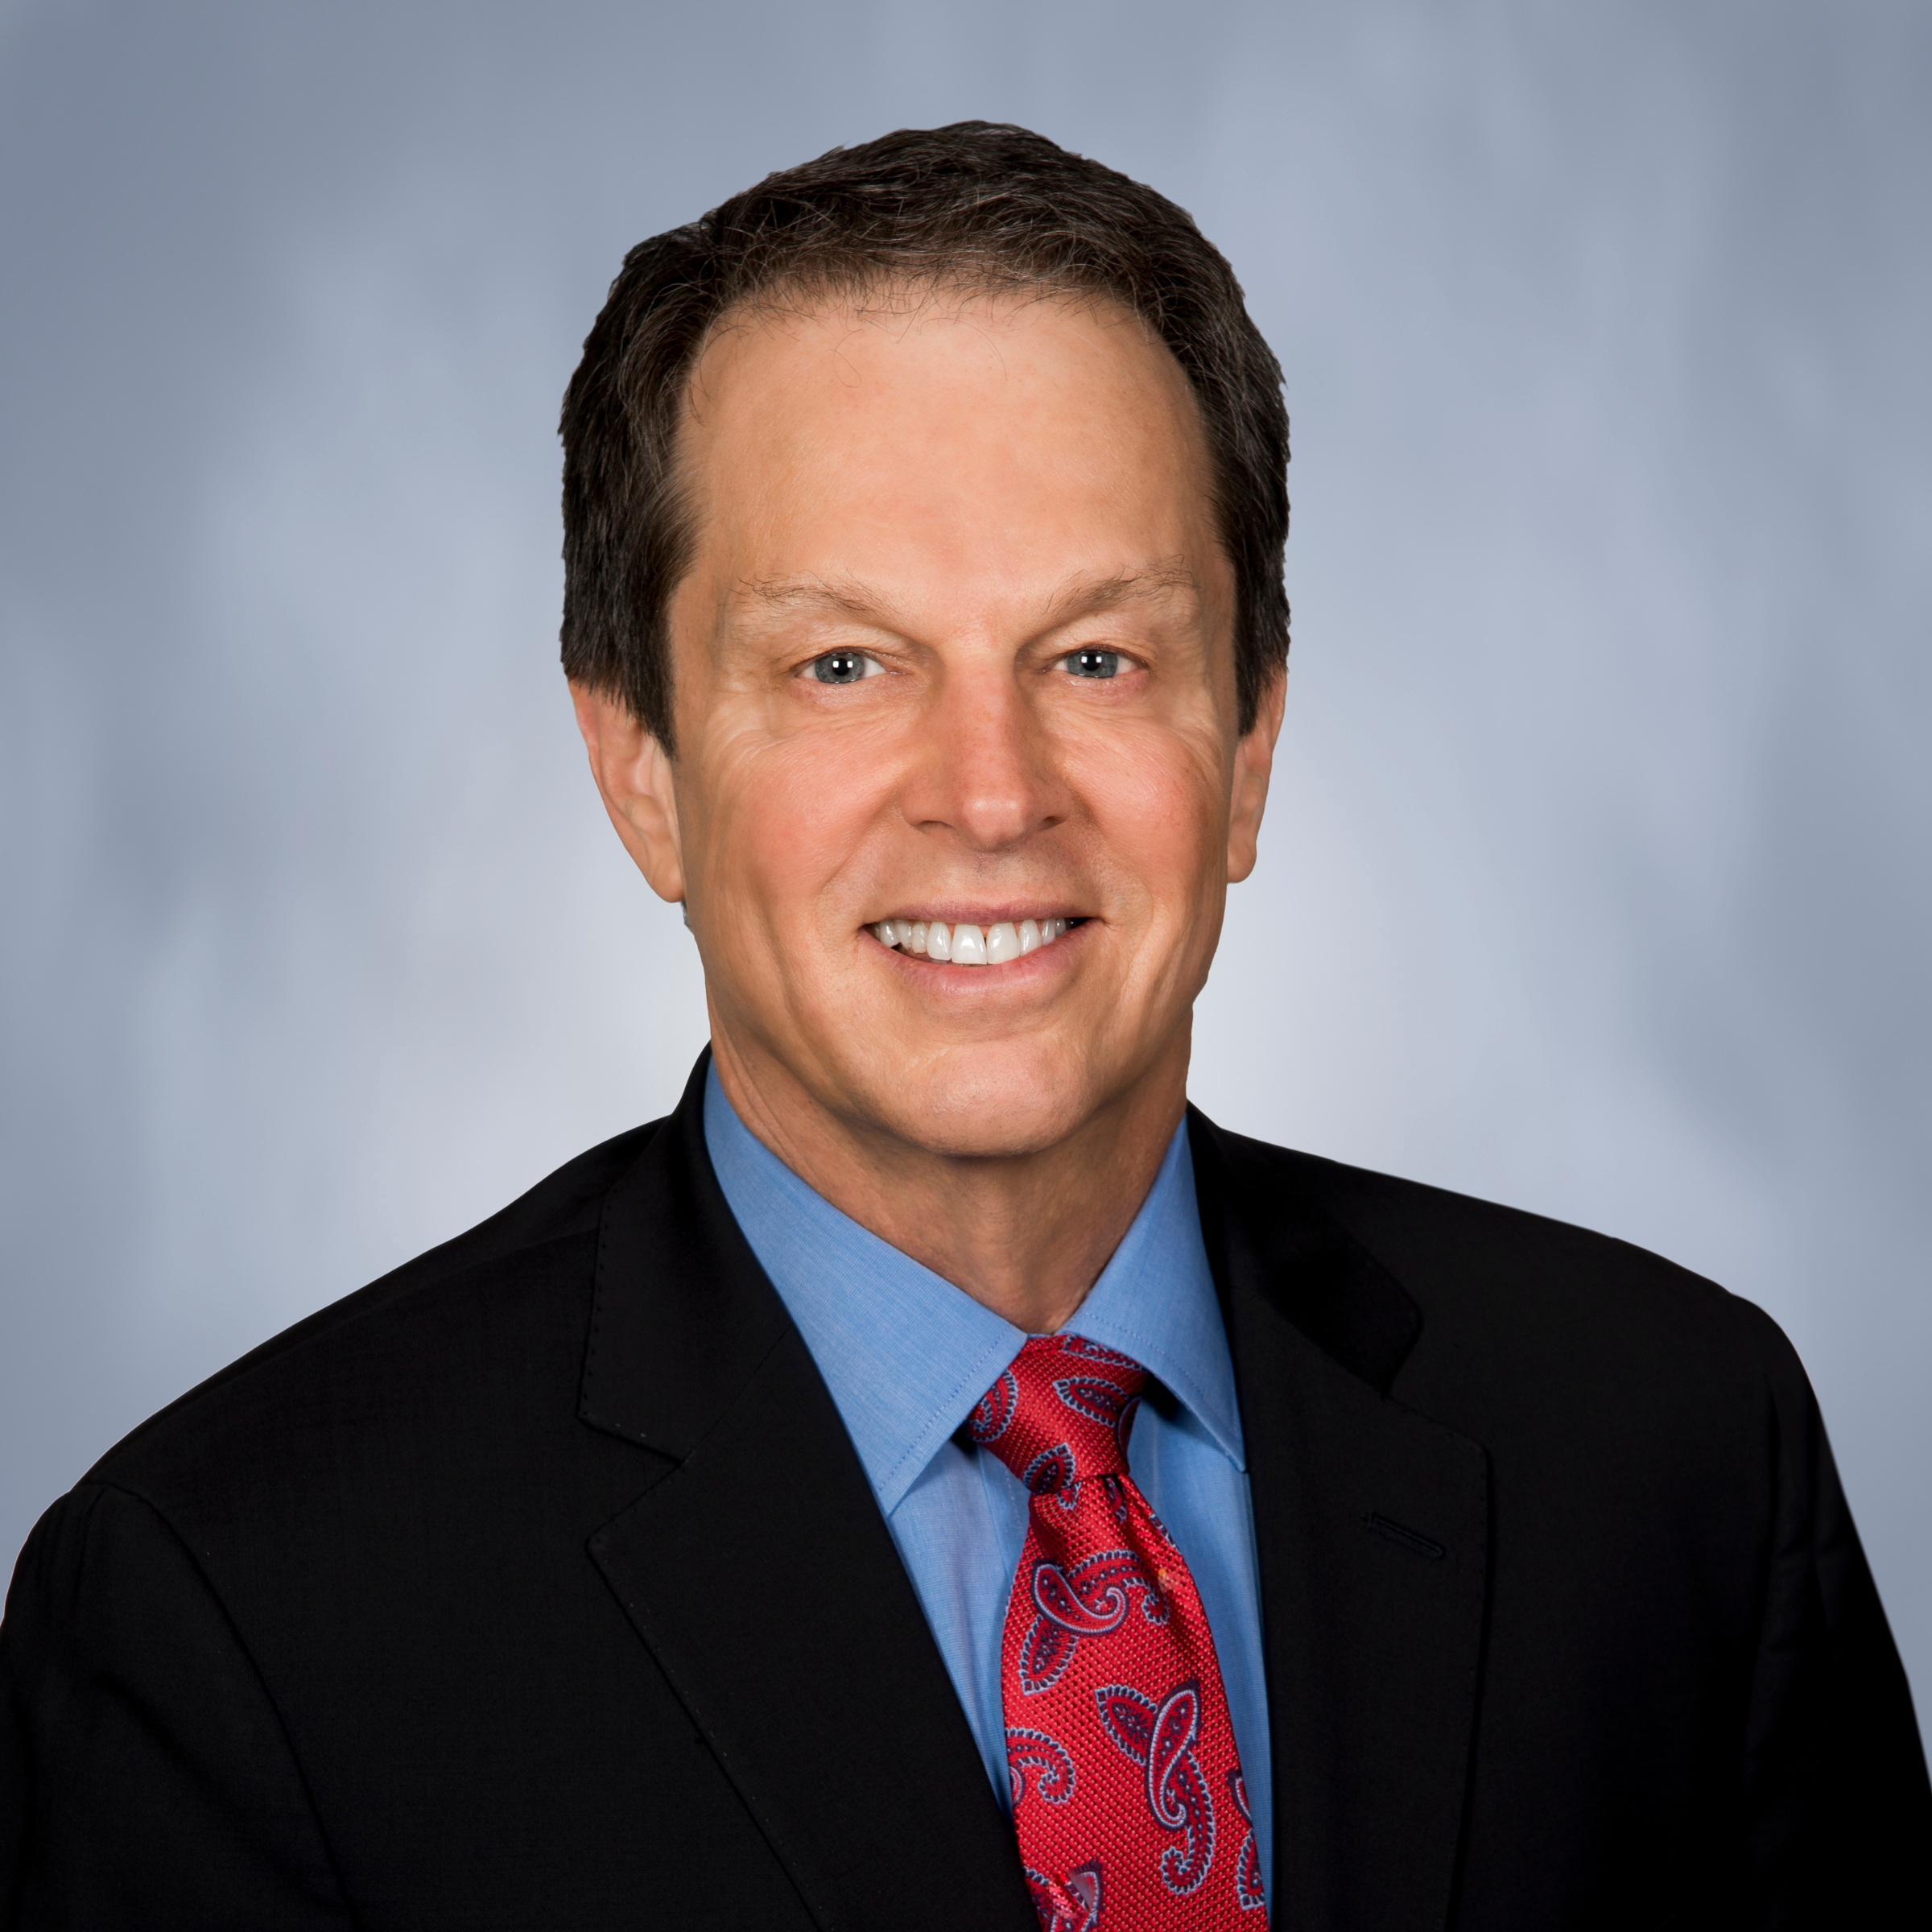 John Kelly, President Florida Atlantic University